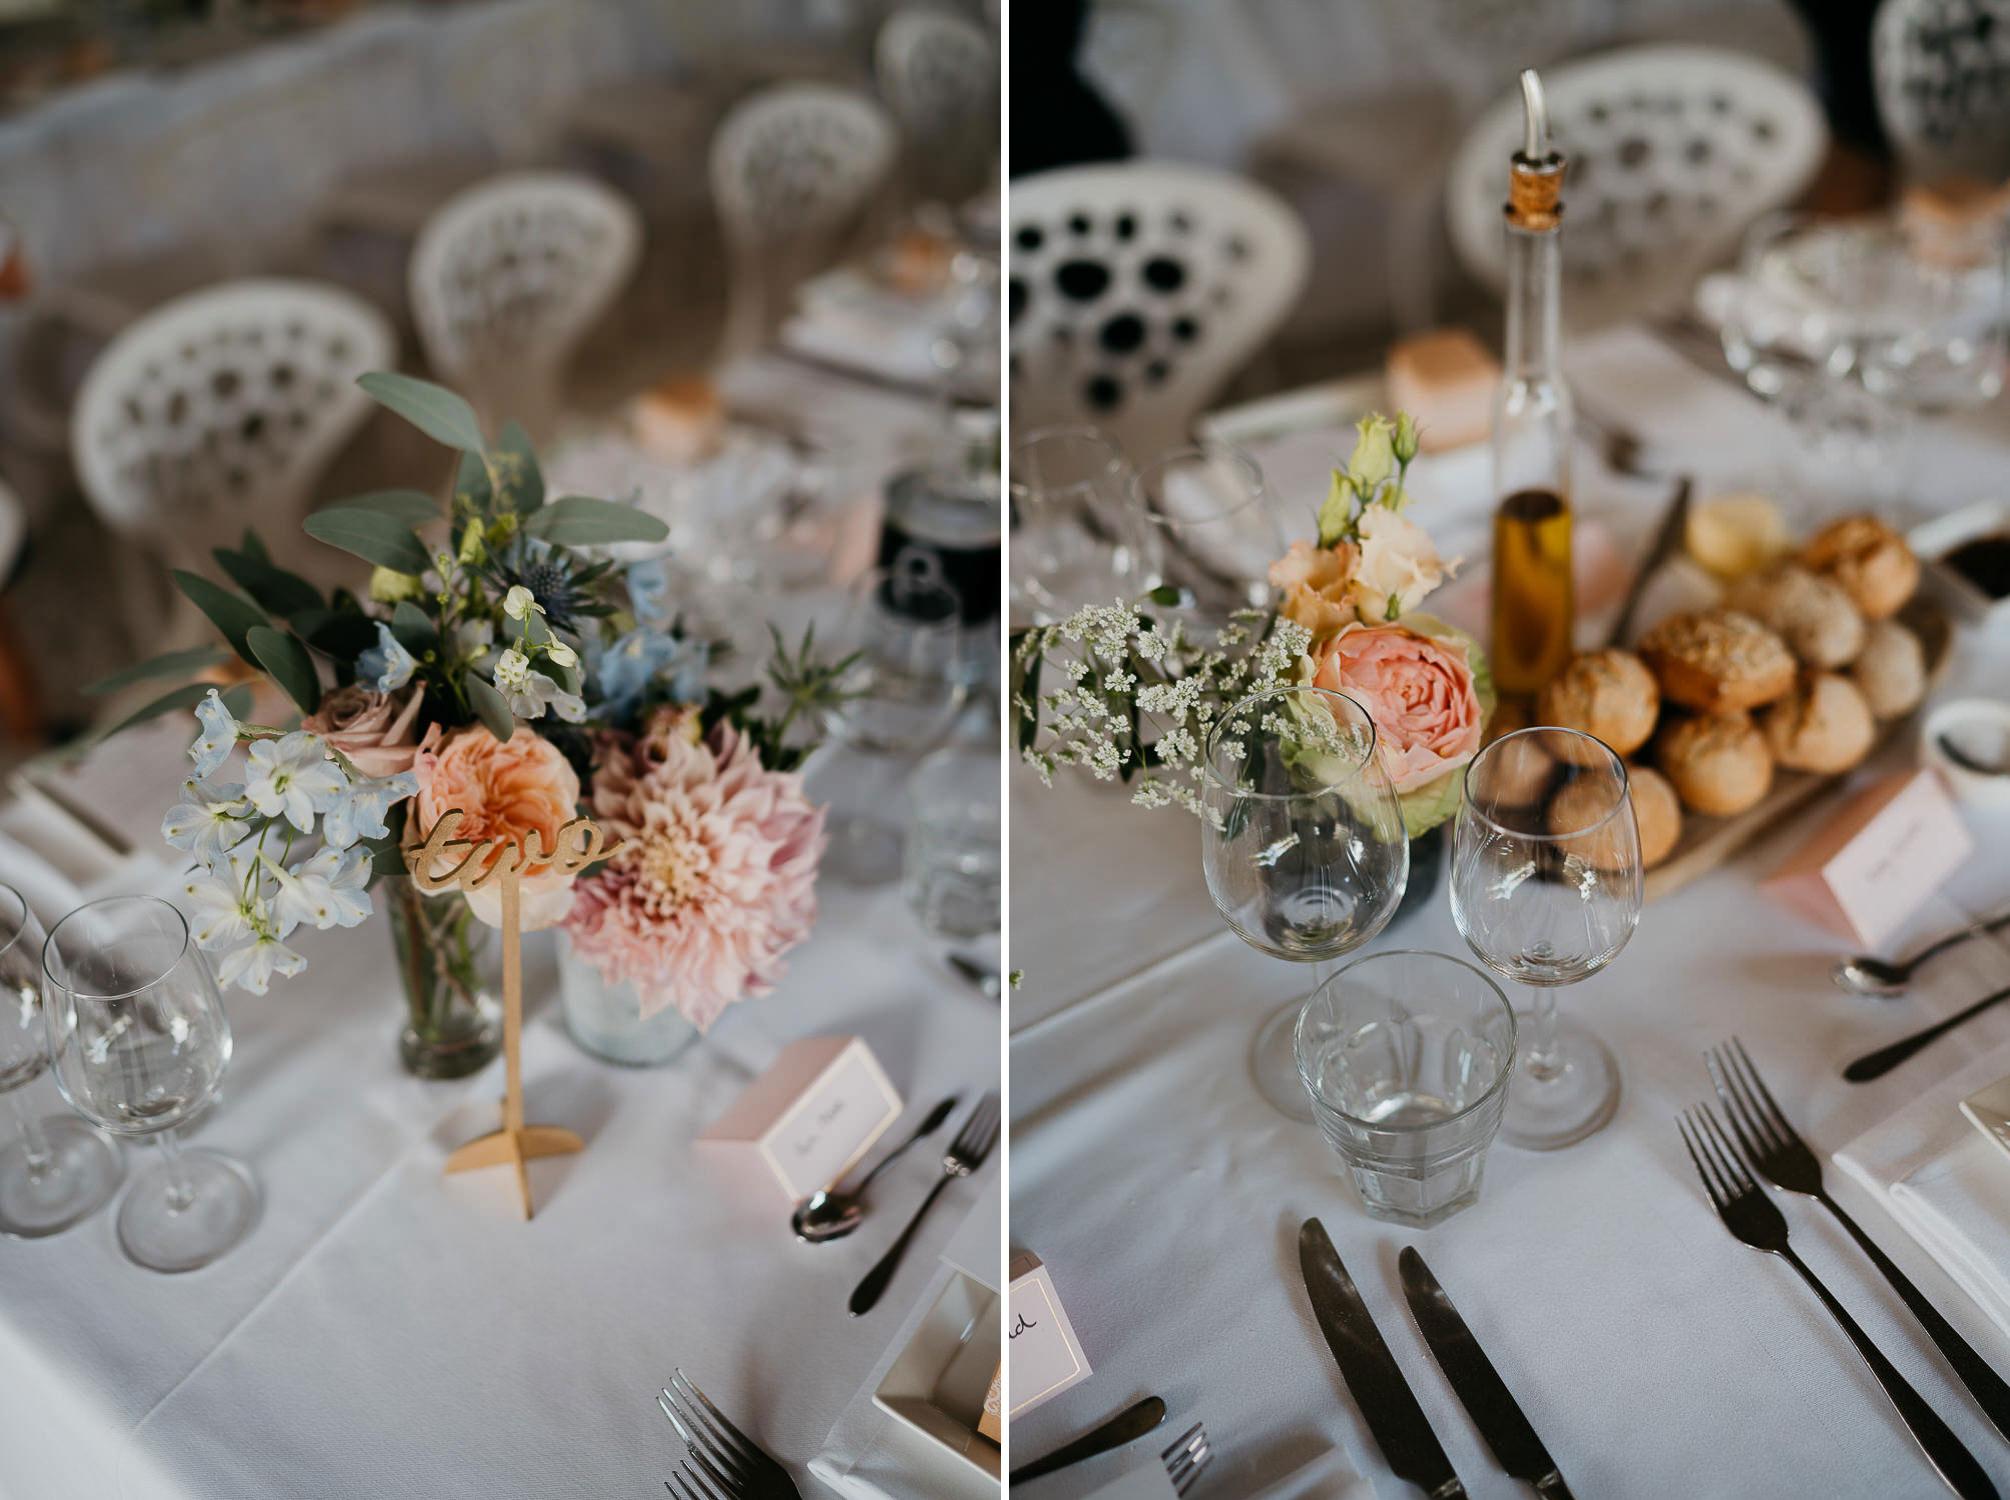 wedding decorations photography details flowers Mark Hadden